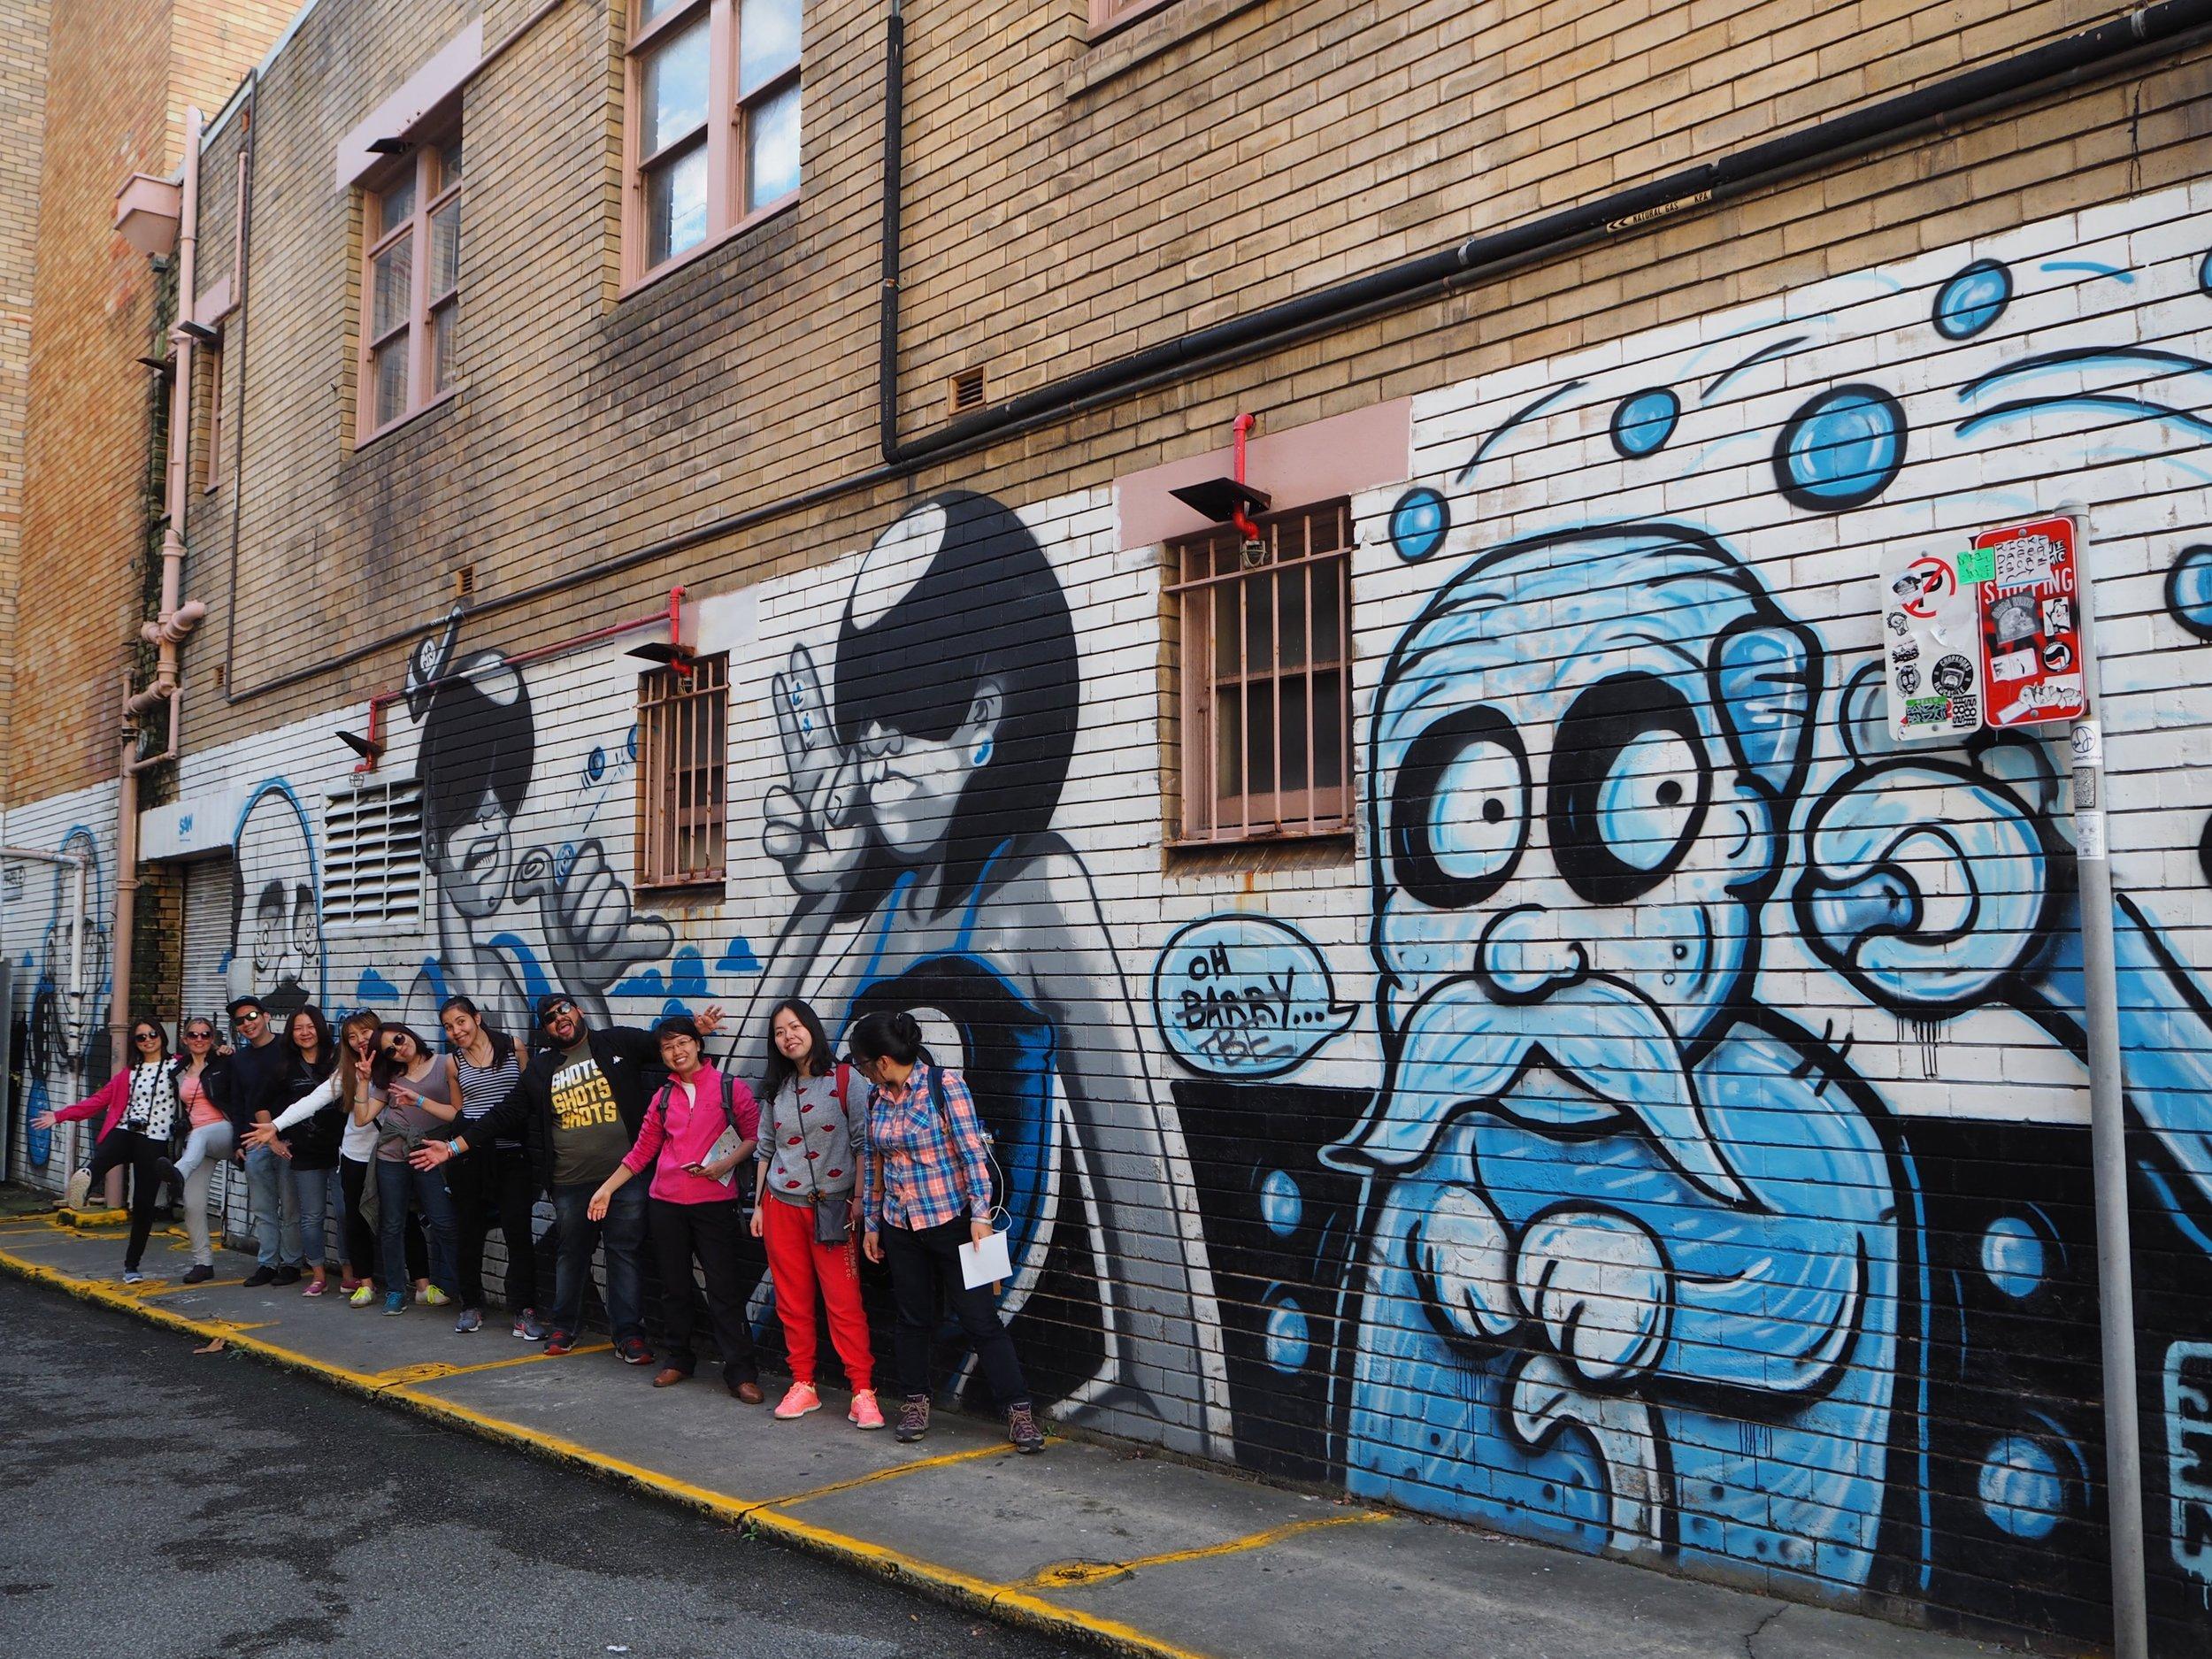 Street_Art_Walking Tour_Photograph_by_Simone_Sheridan009.jpg